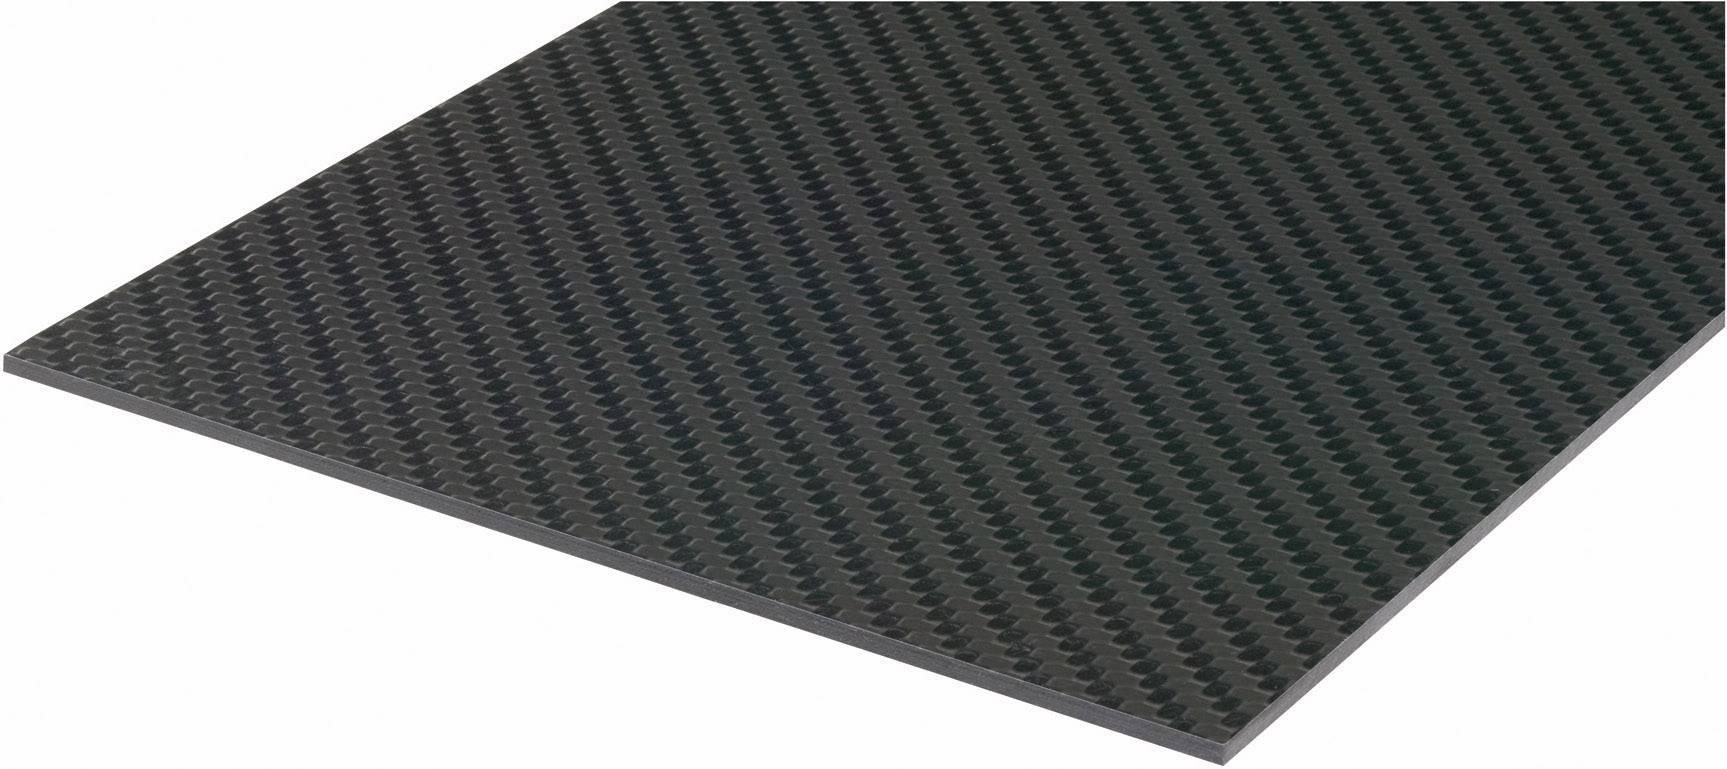 Uhlíková prepreg deska Carbotec 229915, (d x š) 340 mm x 150 mm x 1 mm